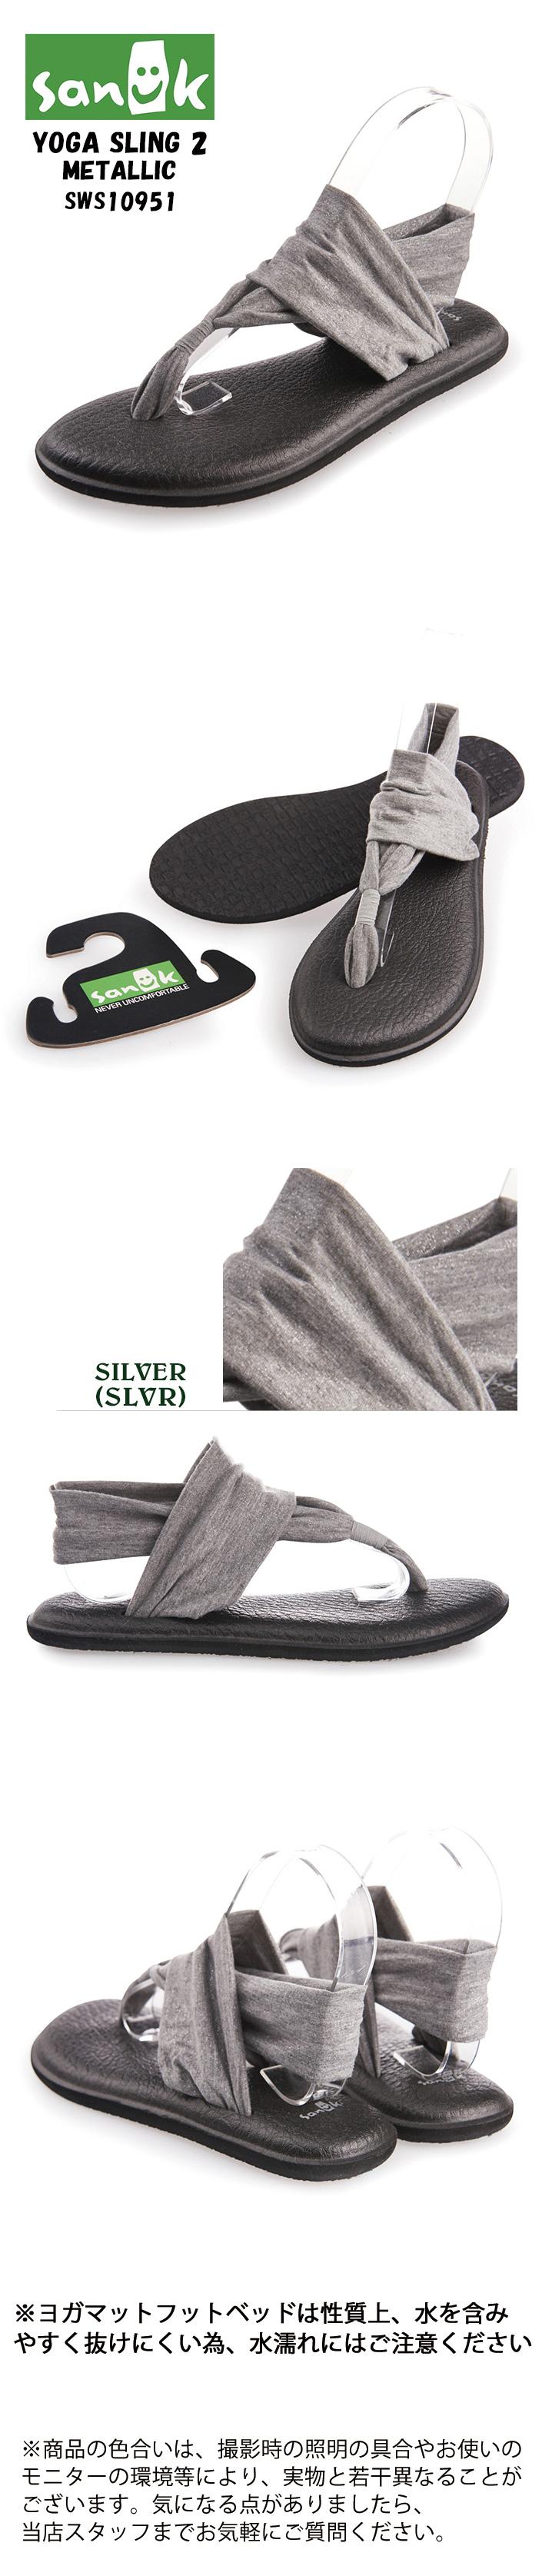 Women Sanuk Yoga Sling 2 Metallic Flip Flop Sandal SWS10951 Silver 100/% Original